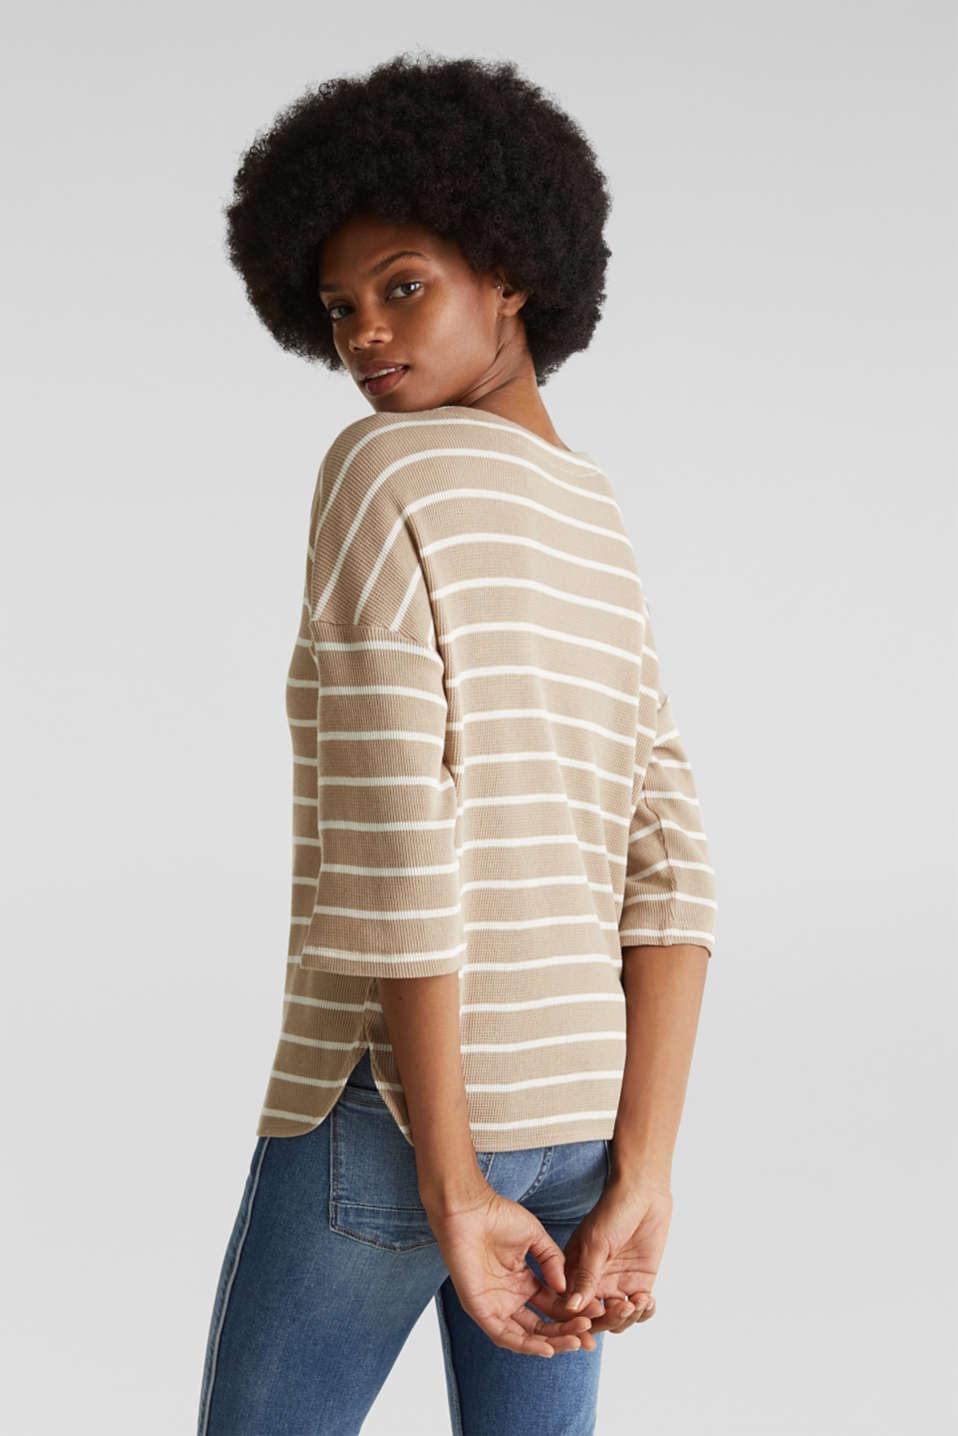 Piqué T-shirt with a casual cut, 100% cotton, BEIGE, detail image number 3